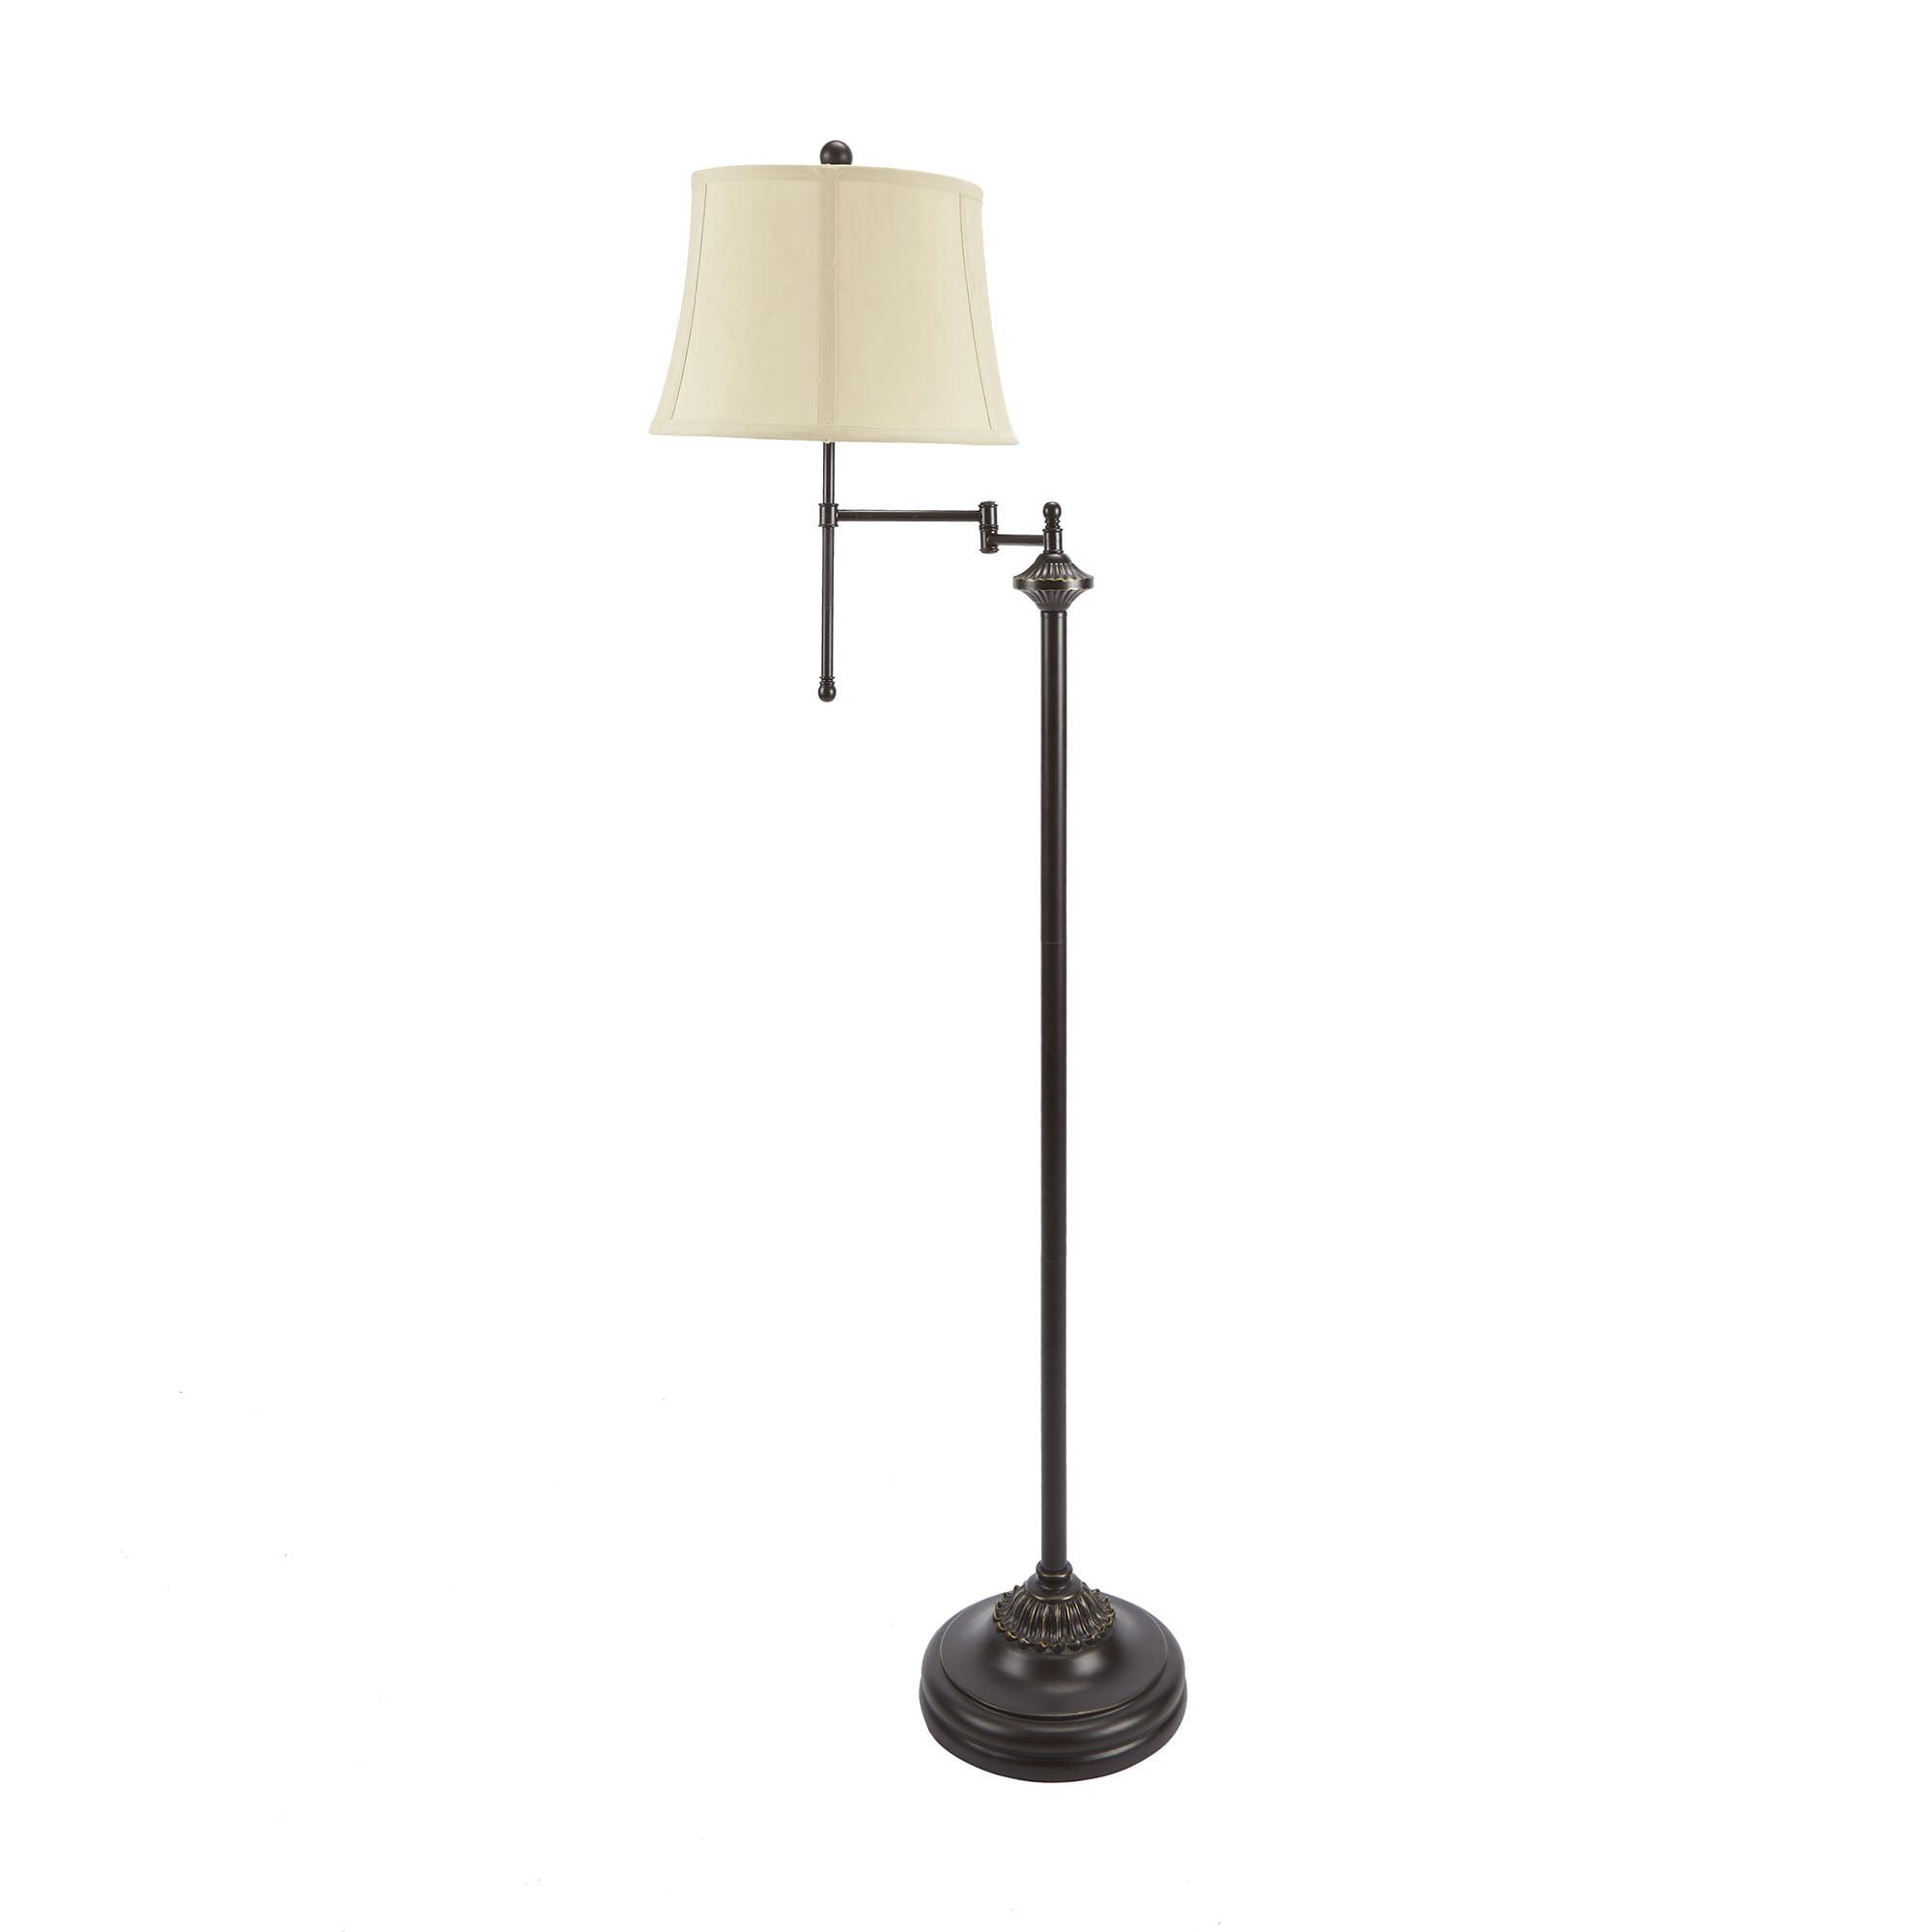 "Better Homes & Gardens 59"" Swing Arm Floor Lamp, CFL Bulb Included"